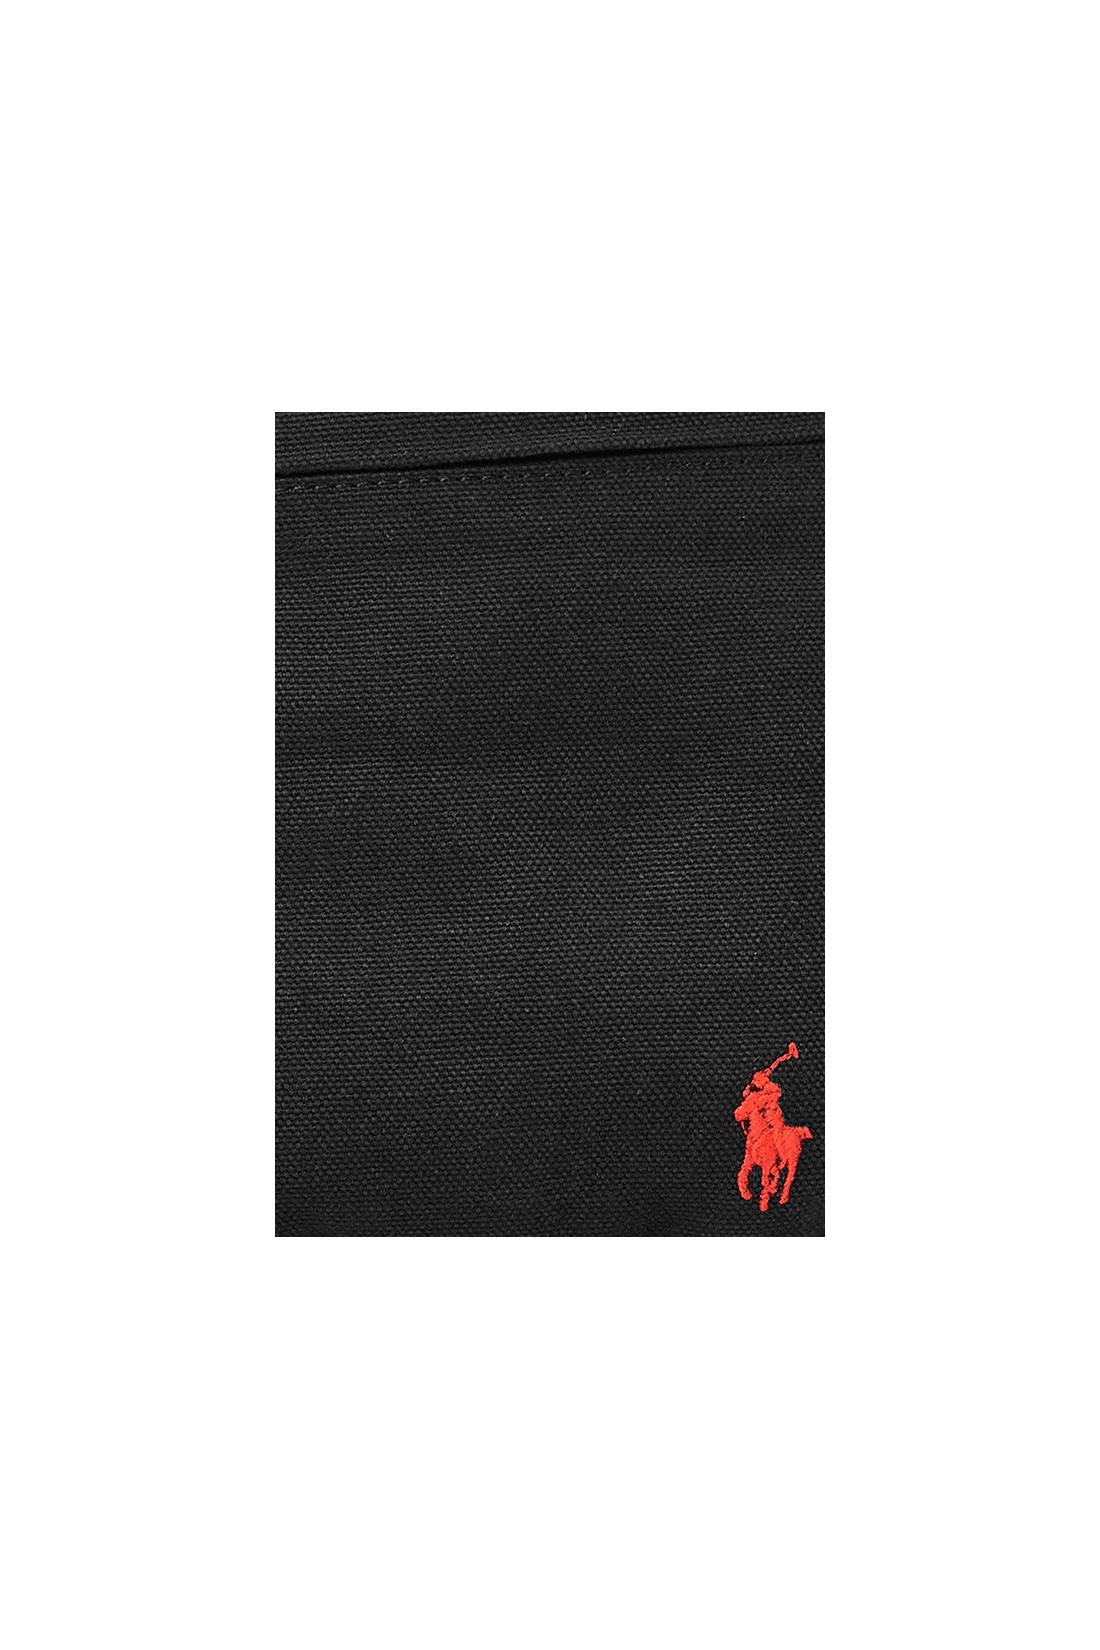 POLO RALPH LAUREN / Waistbag canvas Black